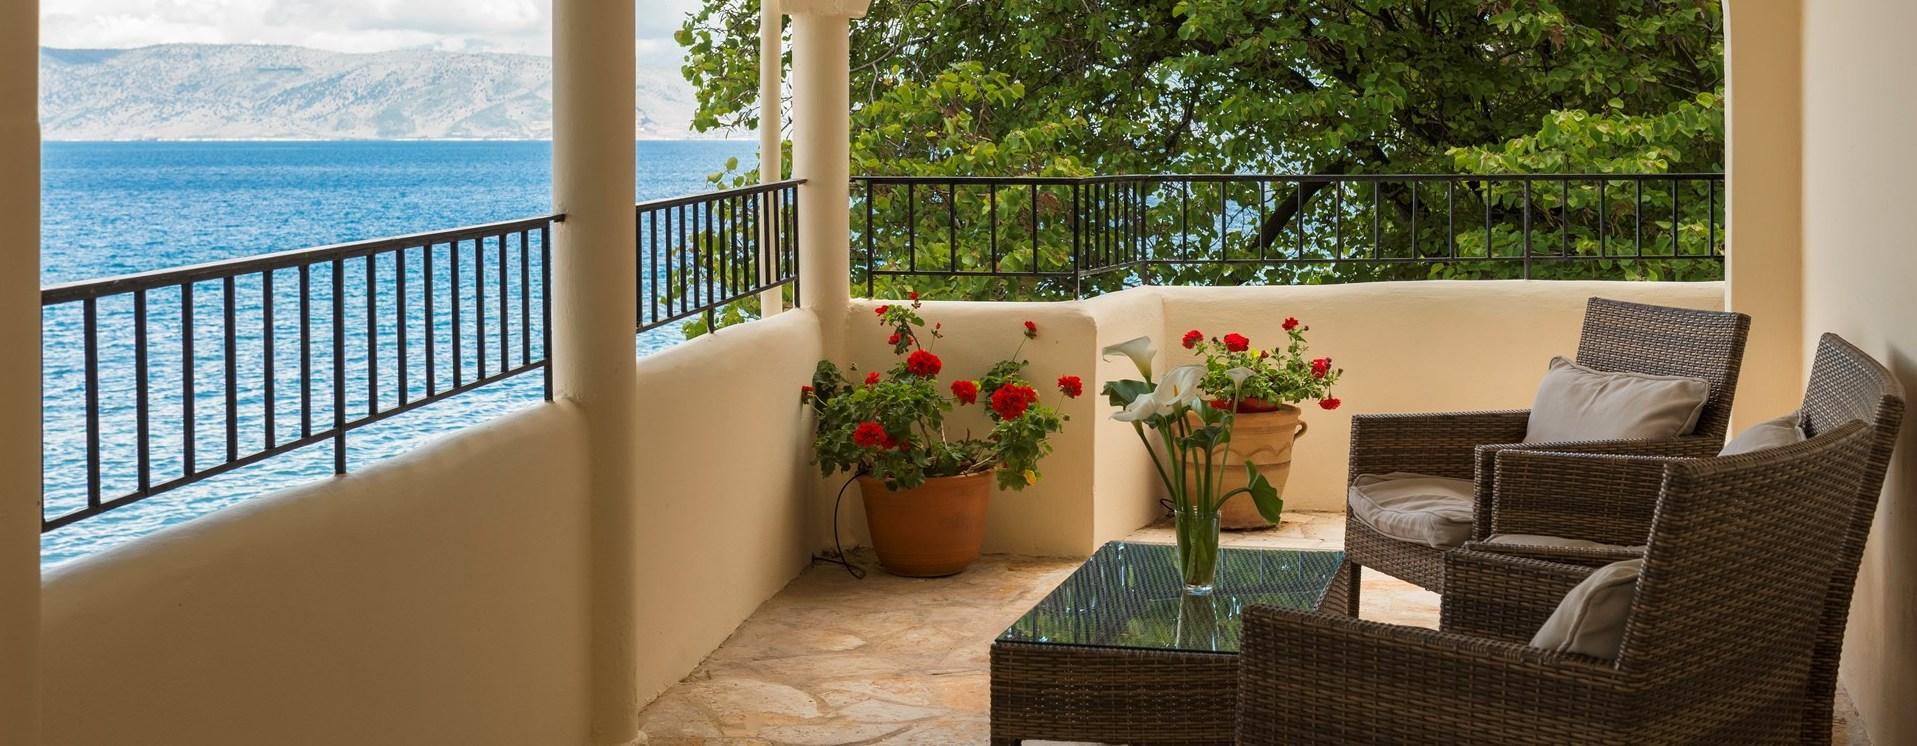 3-bedroom-villa-corfu